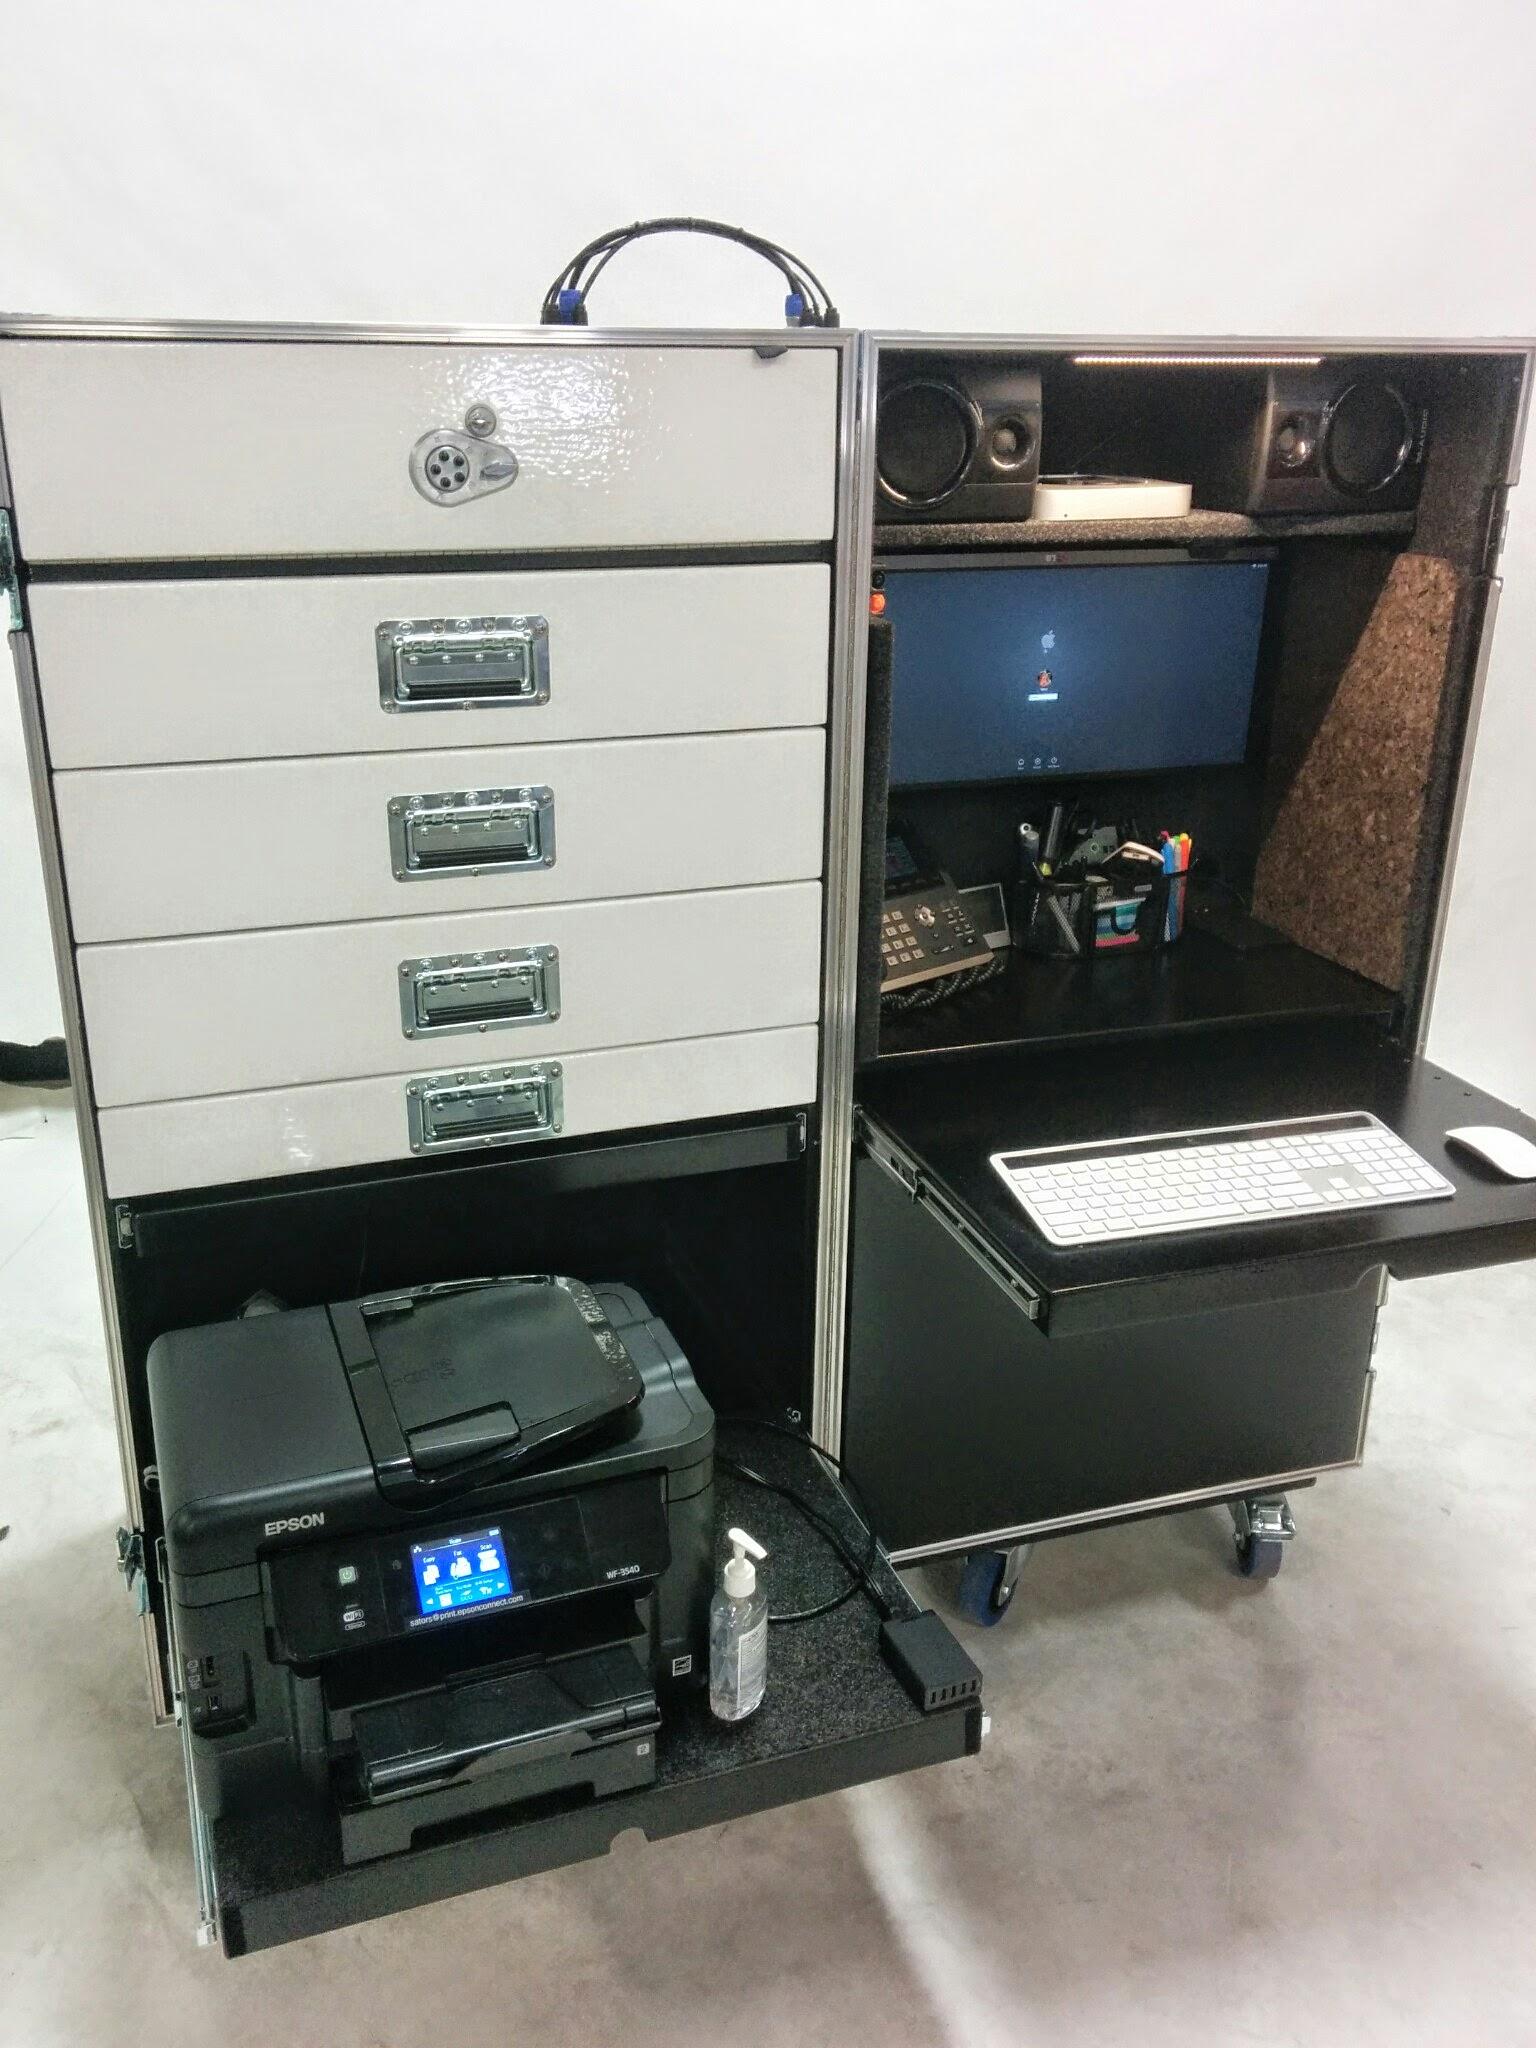 Sators Workbox Production Office Road Case Inside The